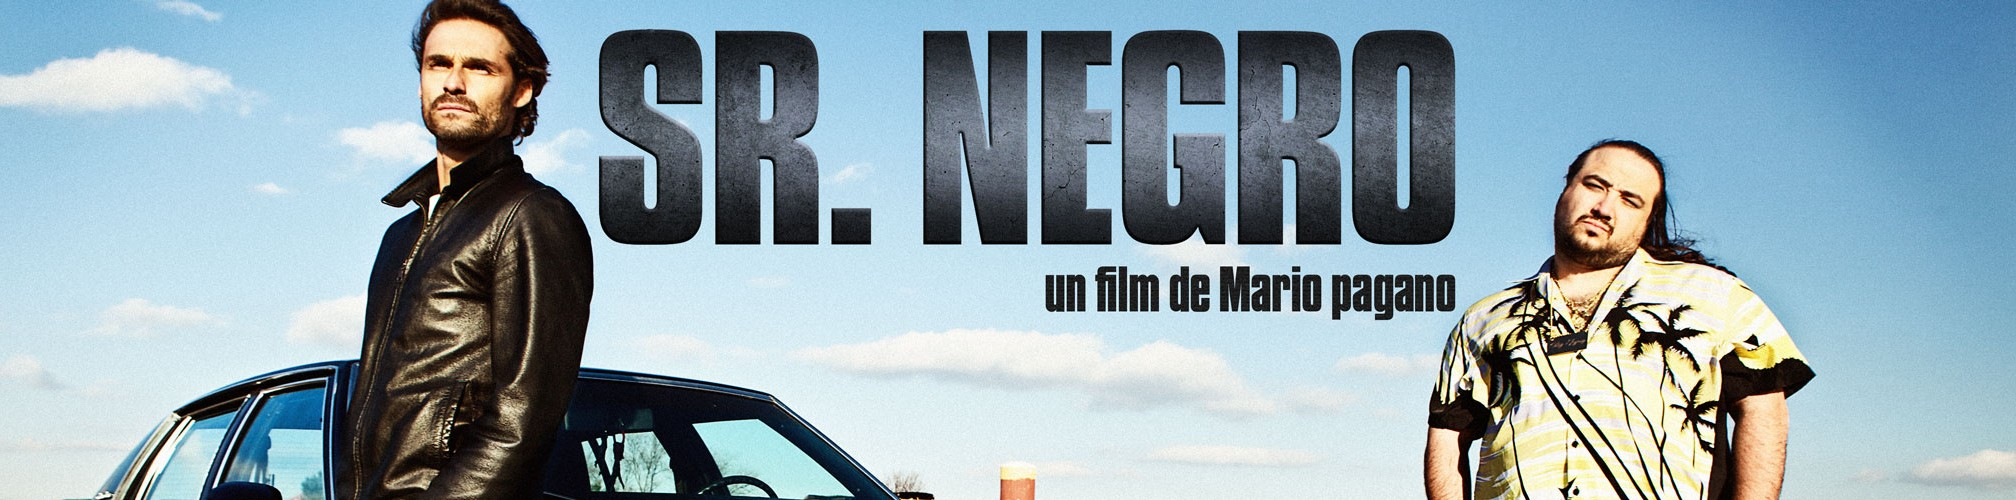 1.Sr. Negro